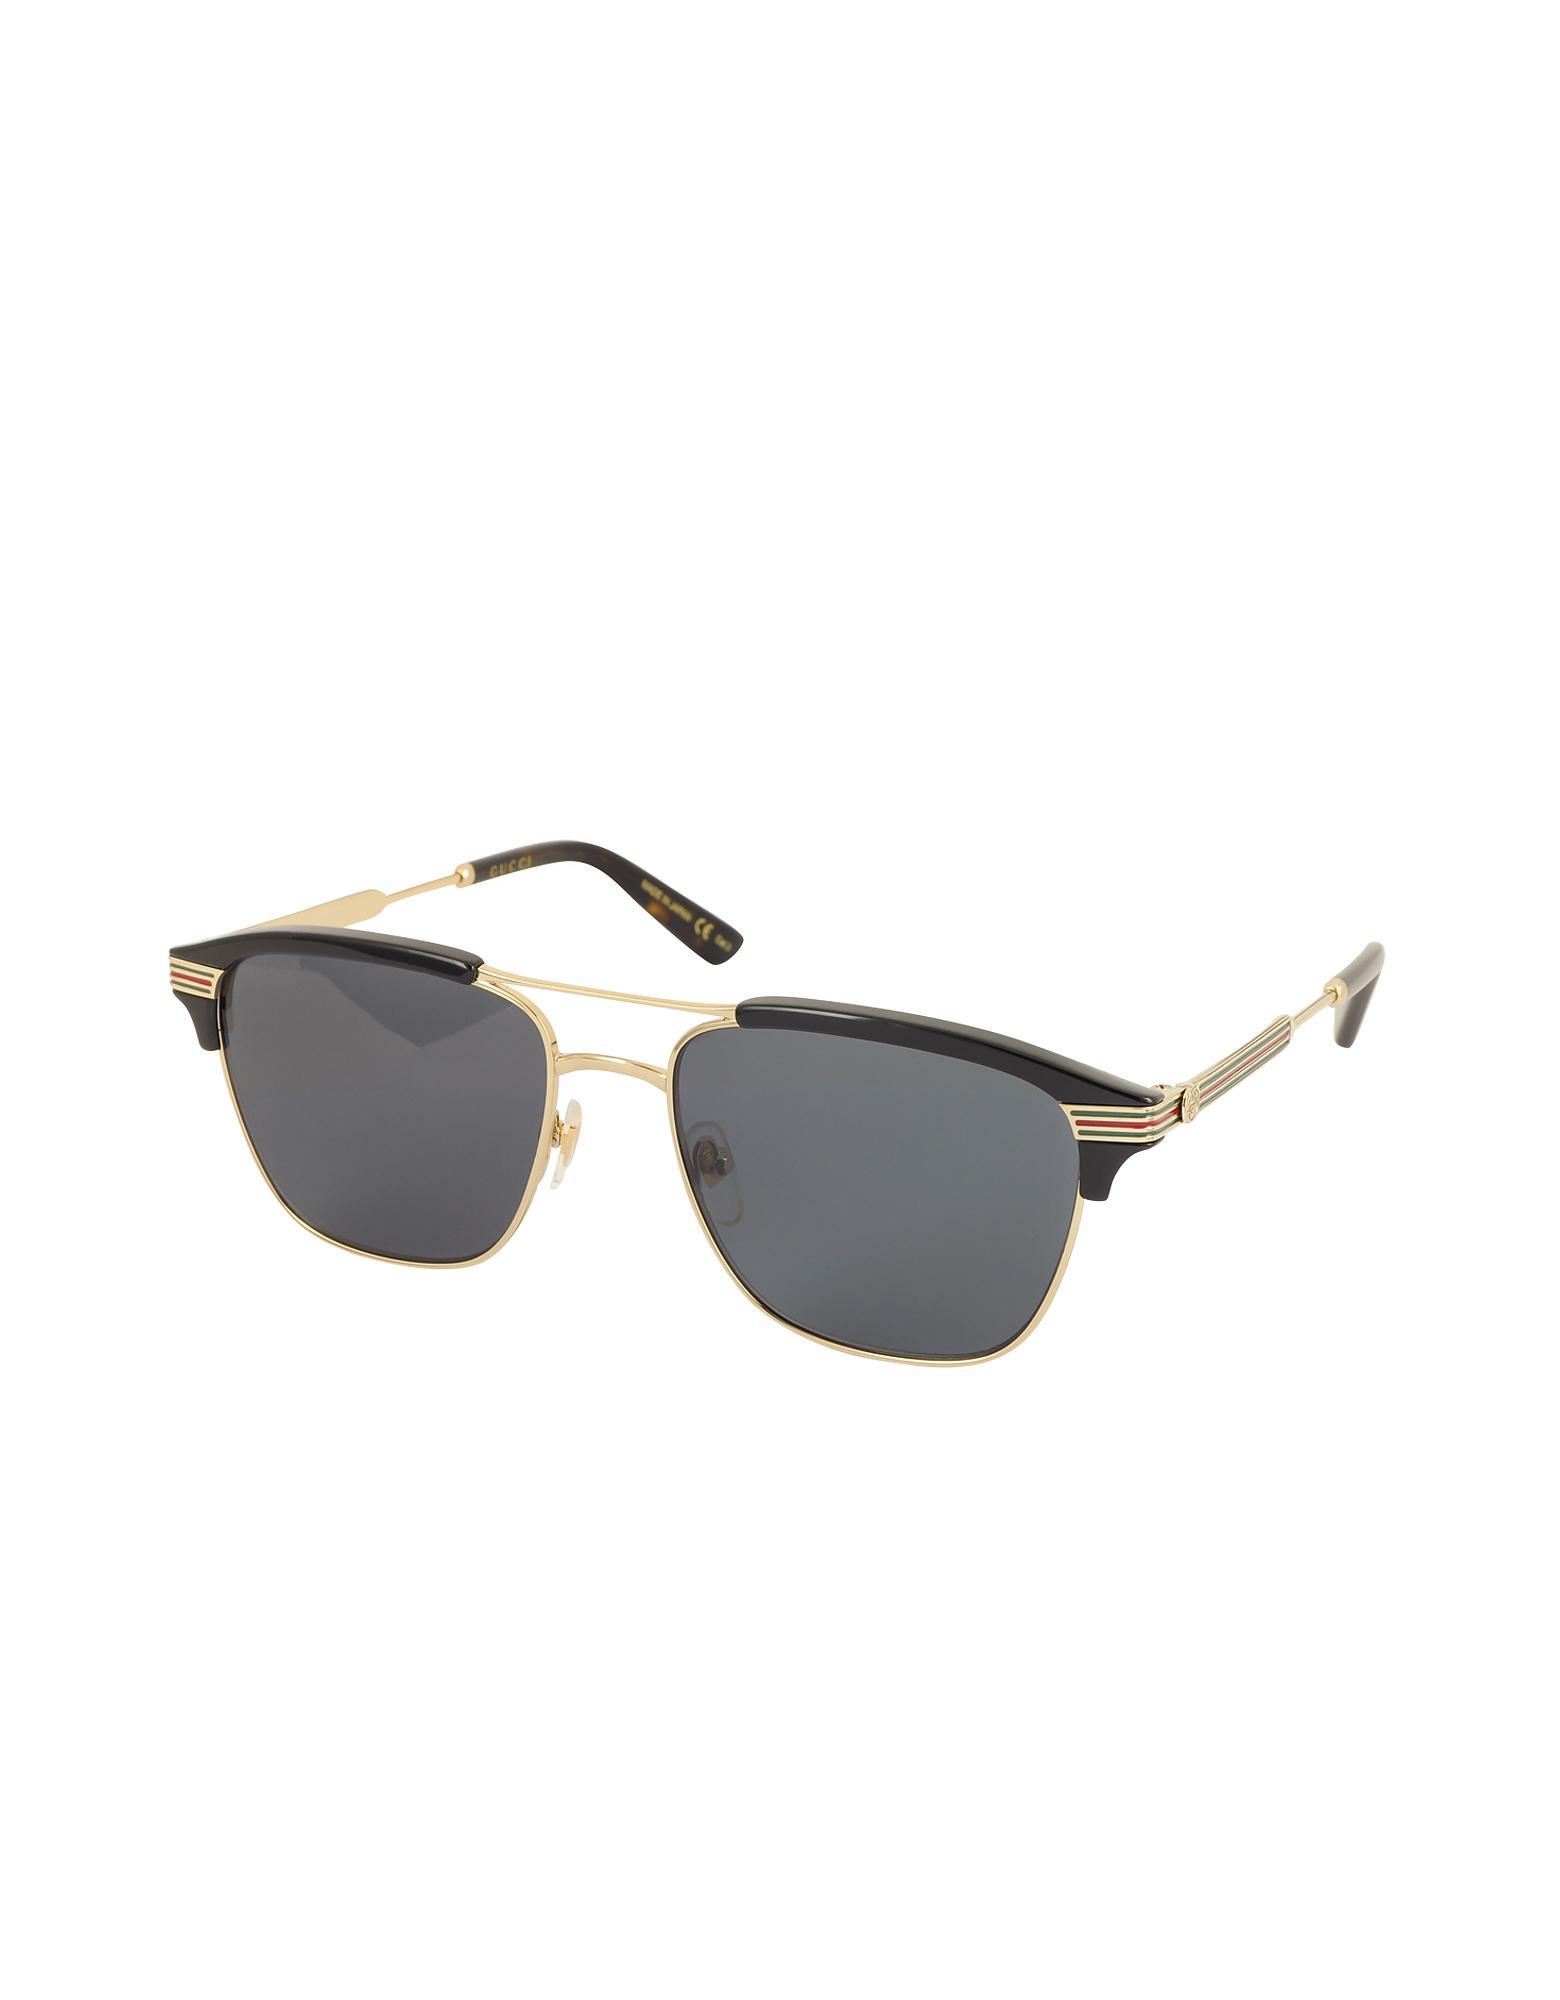 98de099c3c1 Lyst - Gucci GG0241S 002 Square-frame Metal Sunglasses in Black for Men